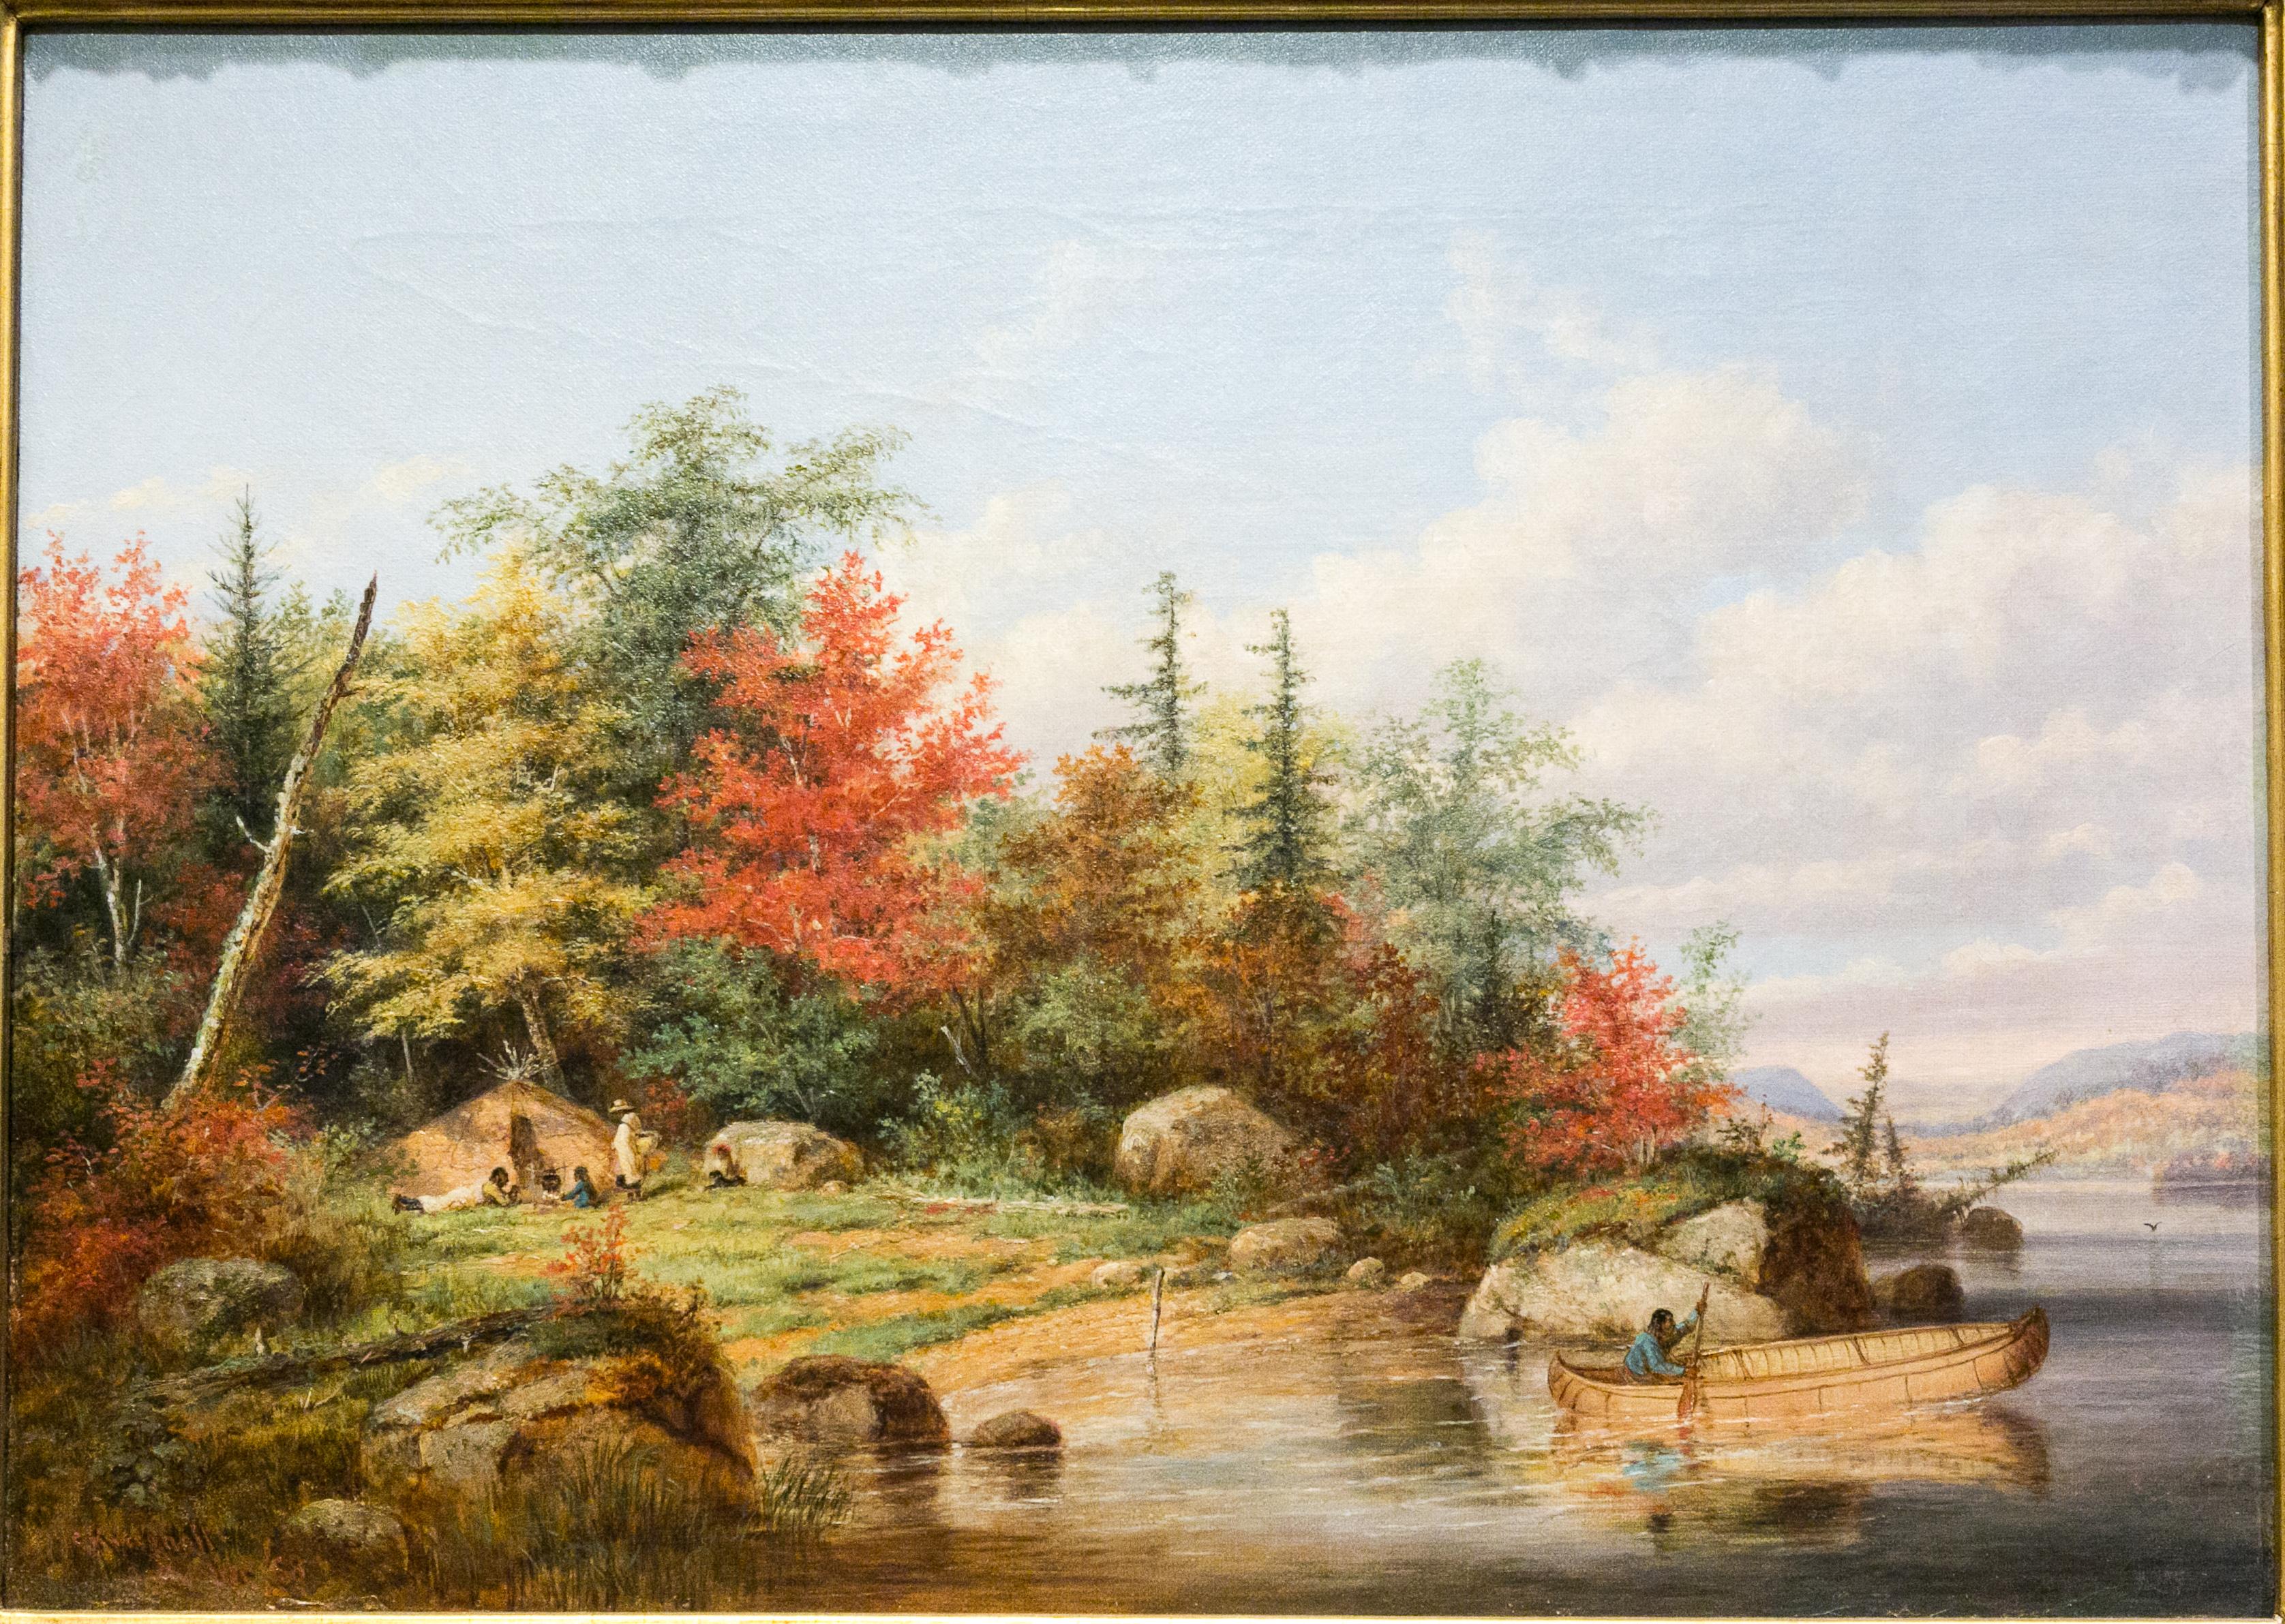 foto de File:MBAM Krieghoff - Paysage d'automne.jpg - Wikimedia Commons